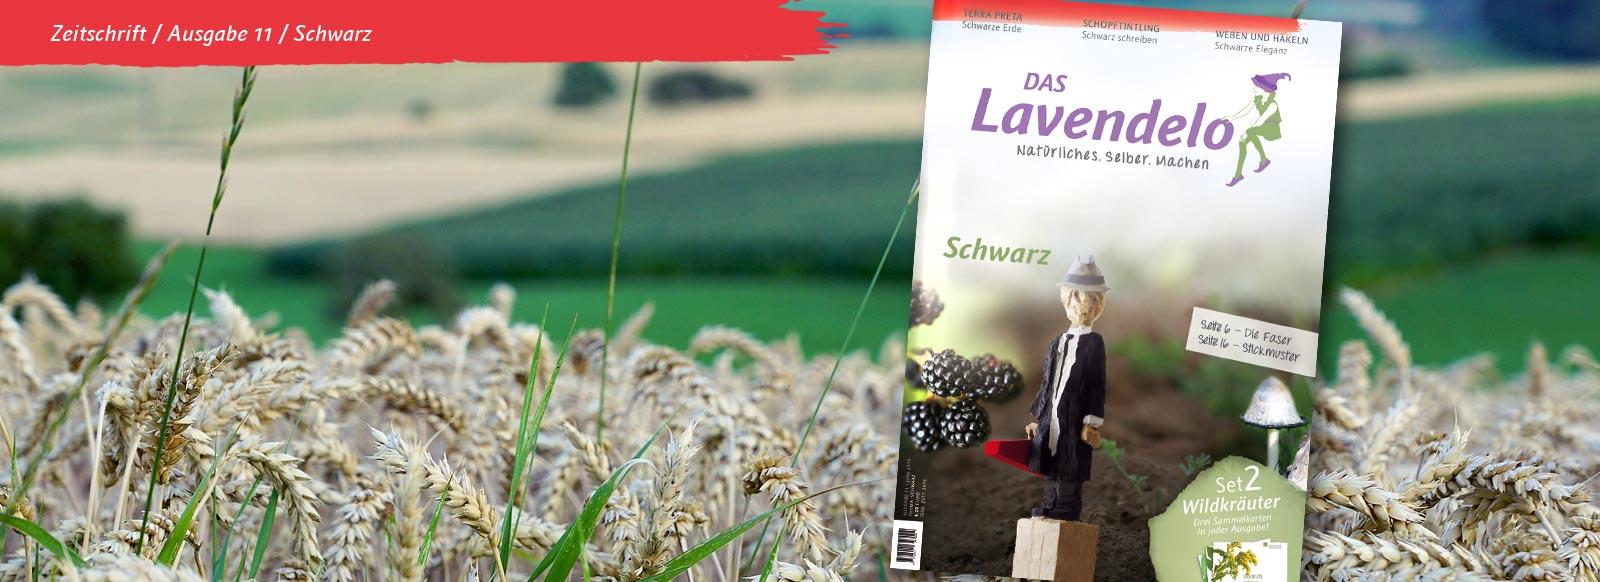 Ausgabe 11 Das Lavendelo Banner